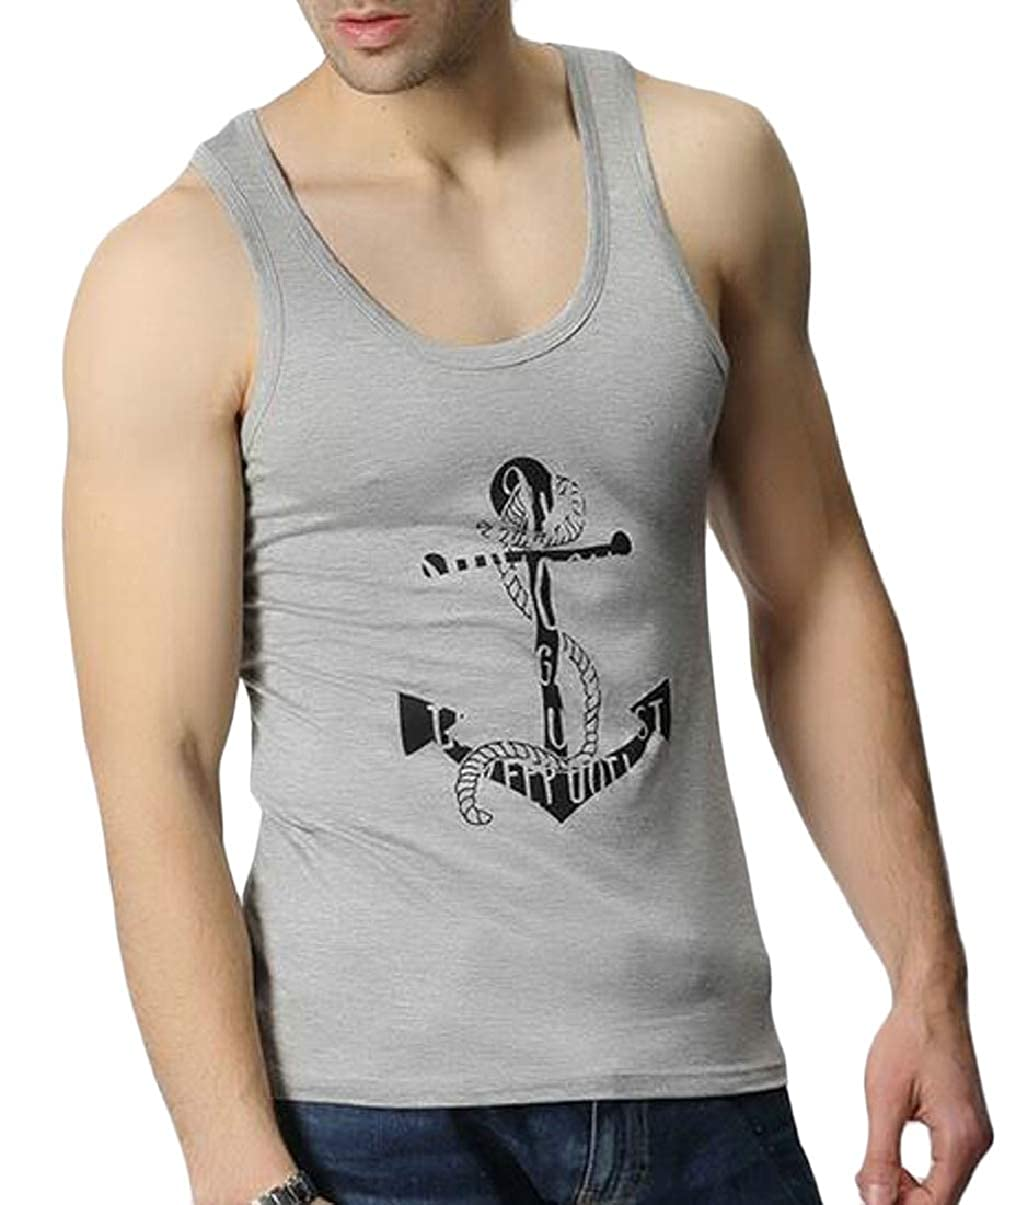 Xswsy XG Men Tank Tops Sleeveless Sport Hiking Blouse Tops Vest